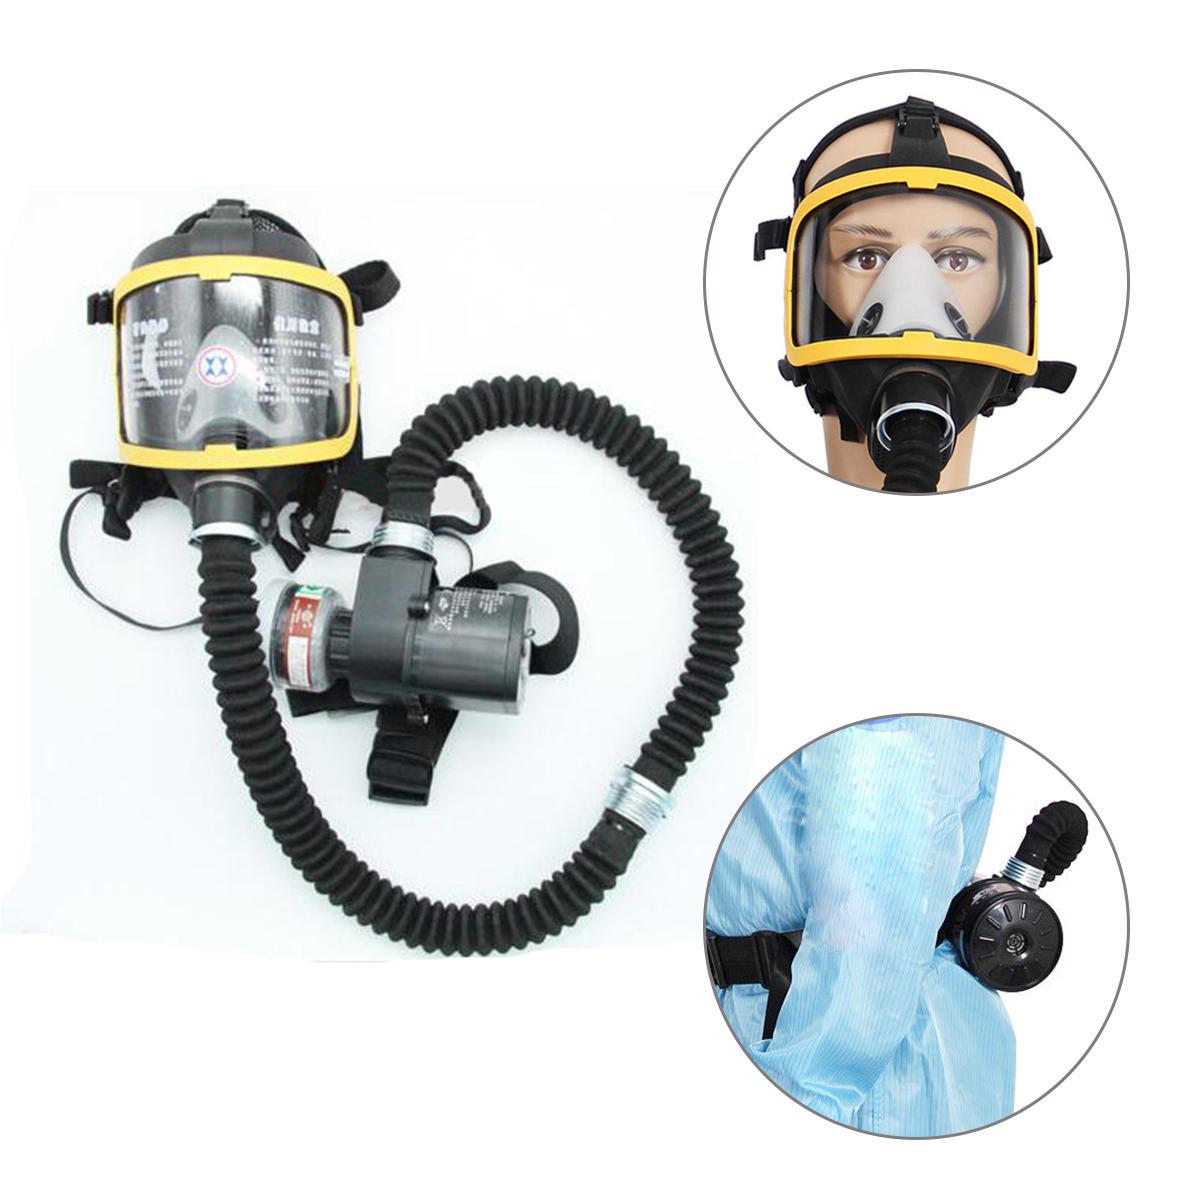 Sistema de respirador de flujo constante de gas de cara completa con suministro de aire Mascara con alimentación eléctrica